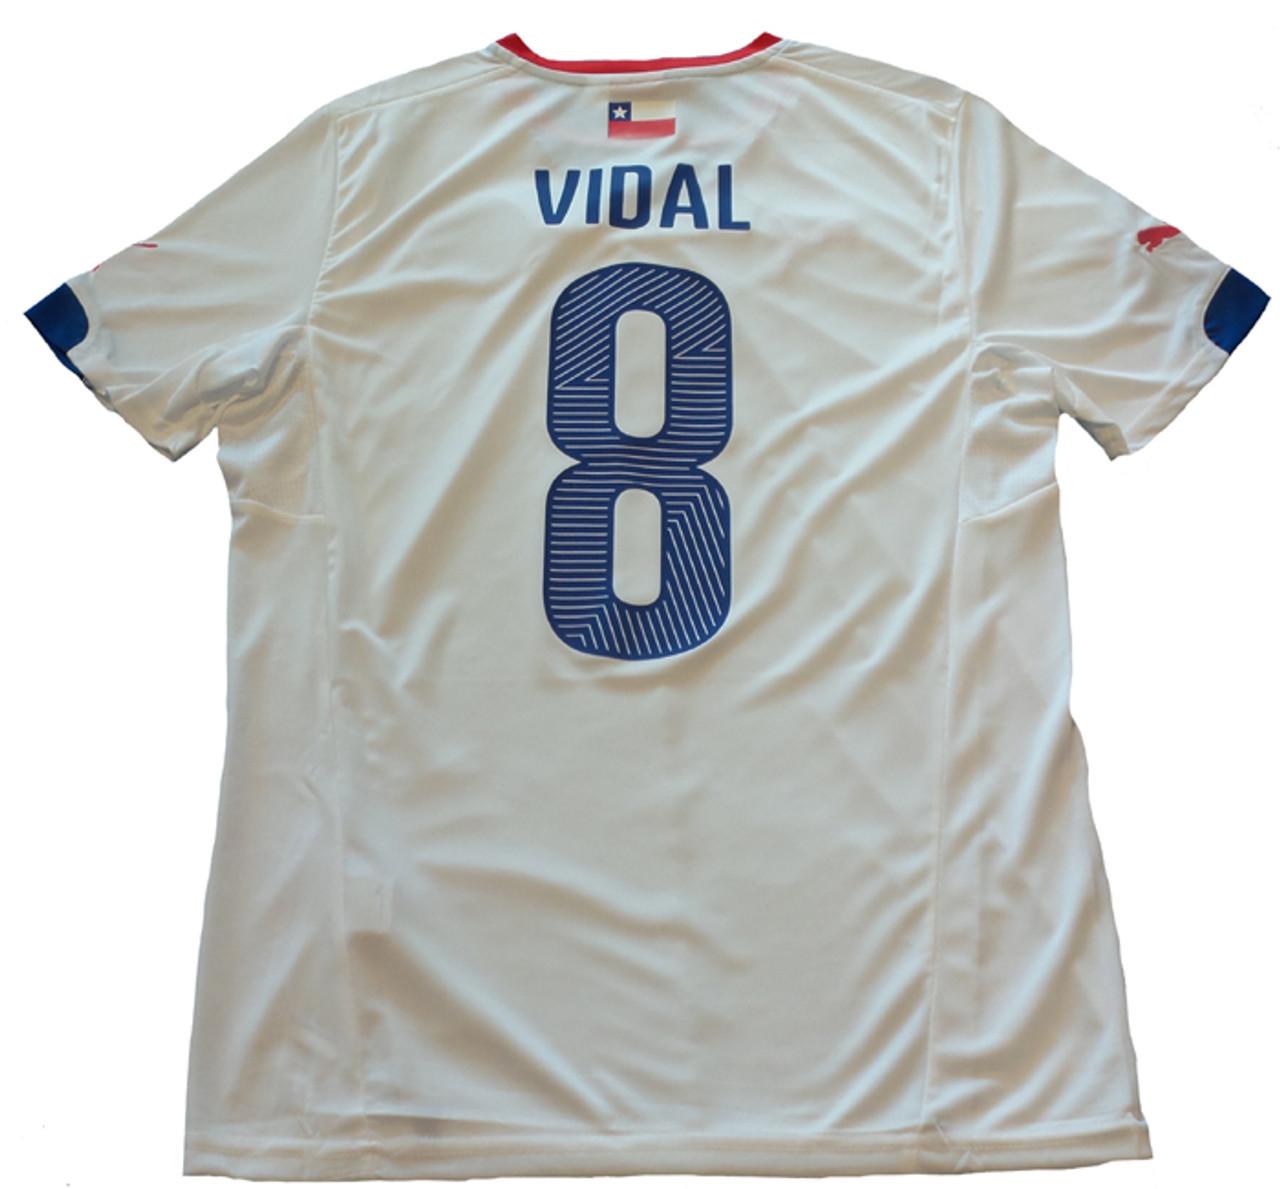 47f0cda8f48 PUMA CHILE 2015 `VIDAL` AWAY JERSEY - Soccer Plus